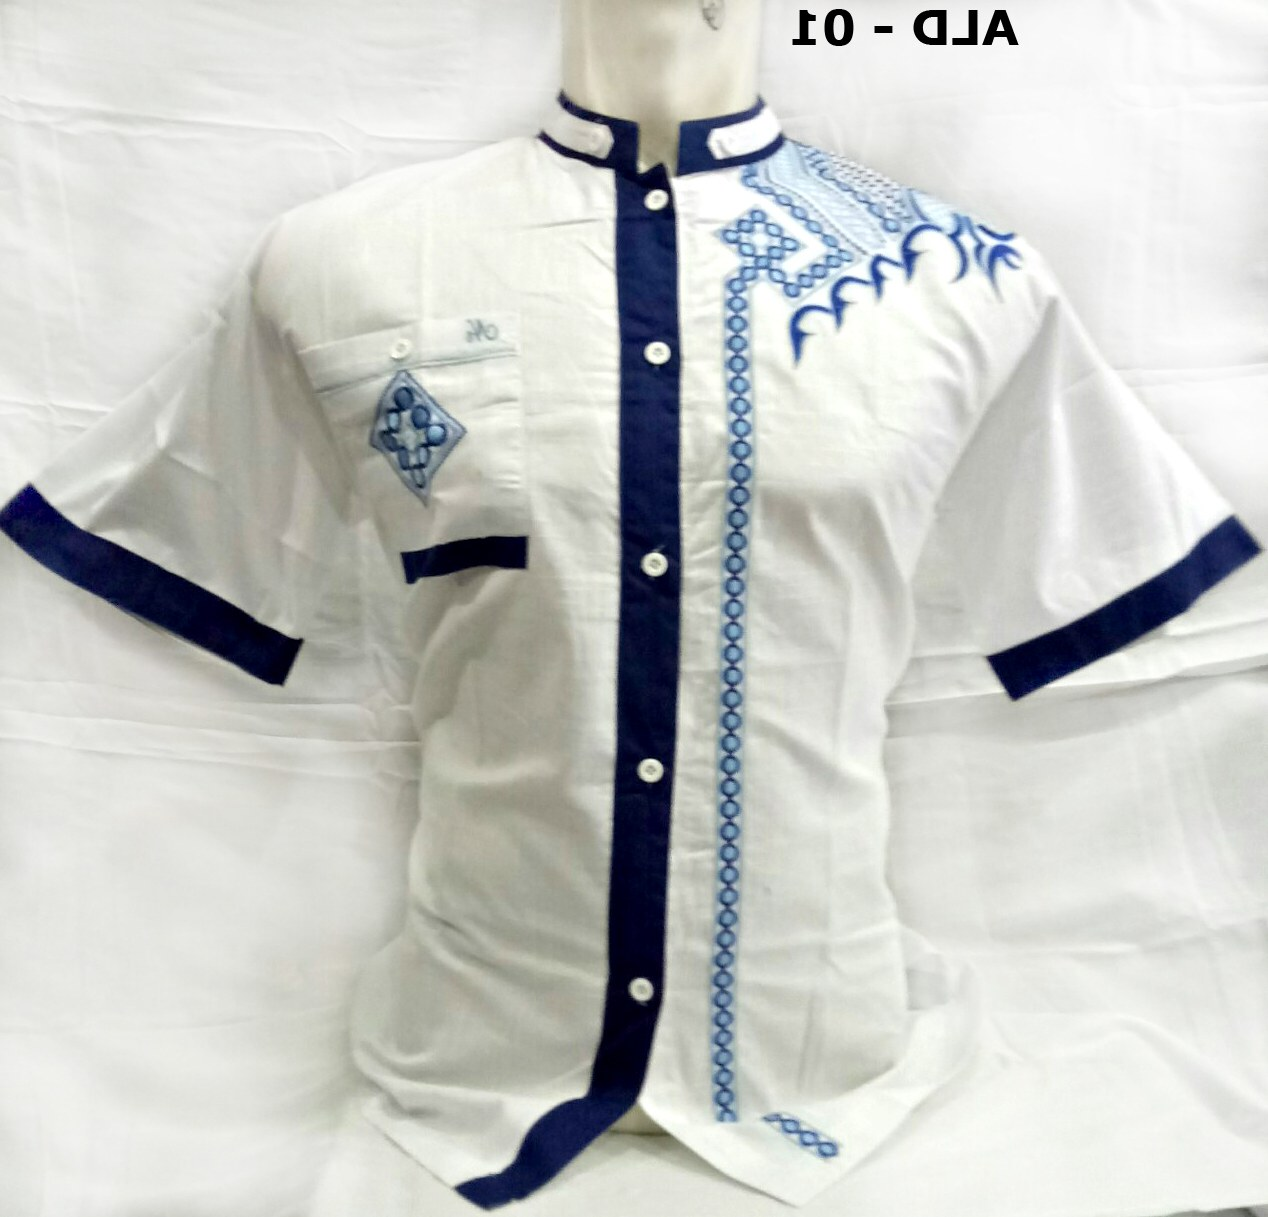 Model Baju Lebaran Putih Bqdd Model Baju Koko Lebaran 2018 Terbaru Dan Harganya Murah